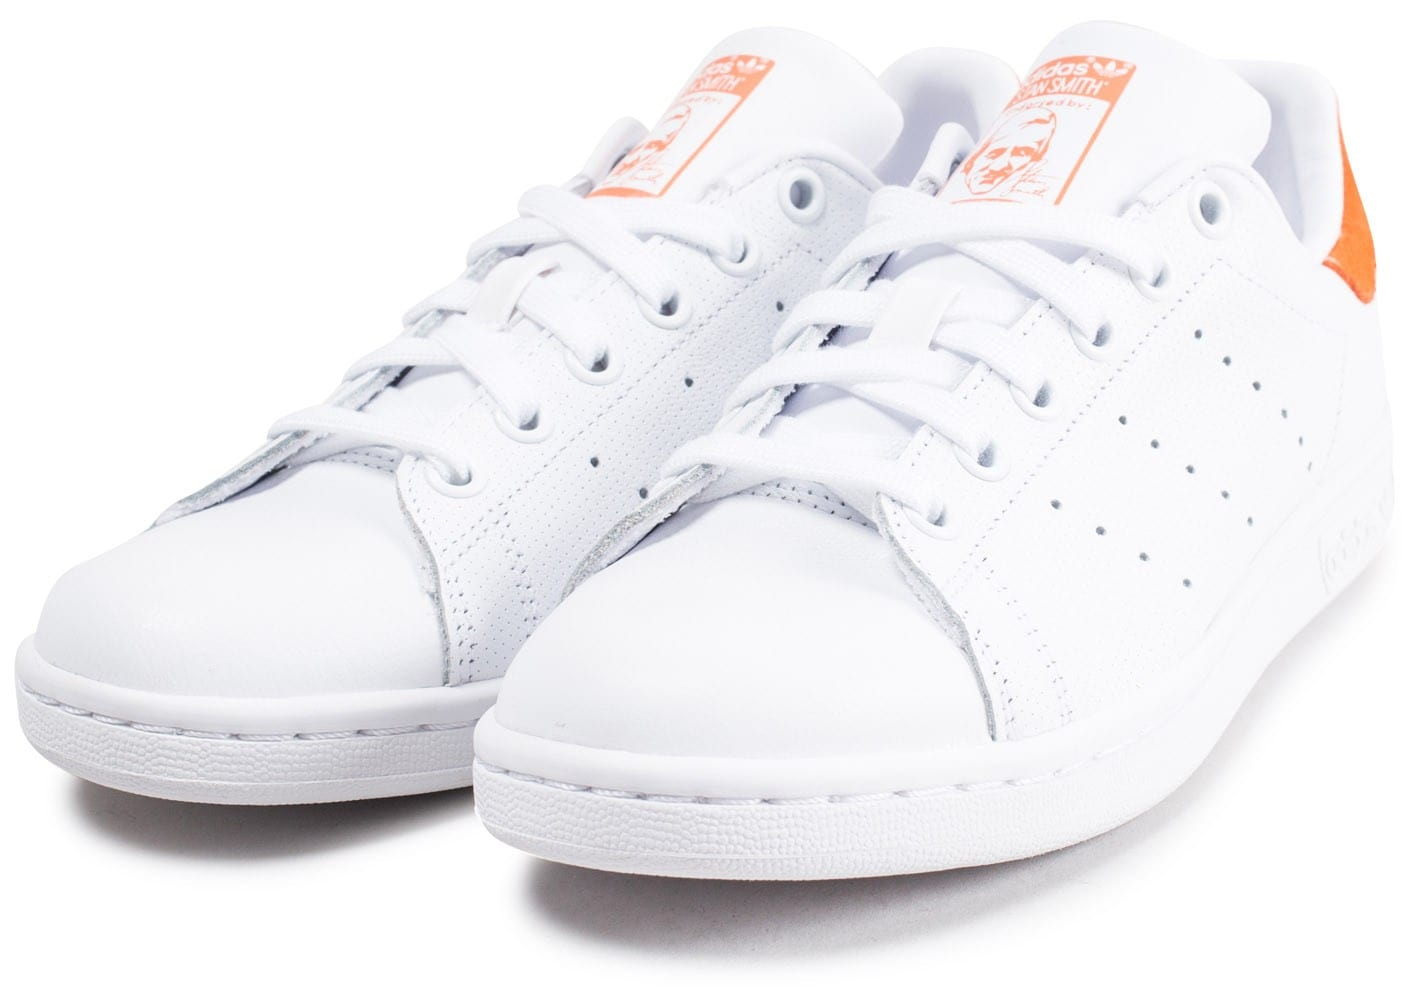 meilleures baskets 456cf e3ee3 adidas stan smith femme orange Avis en ligne